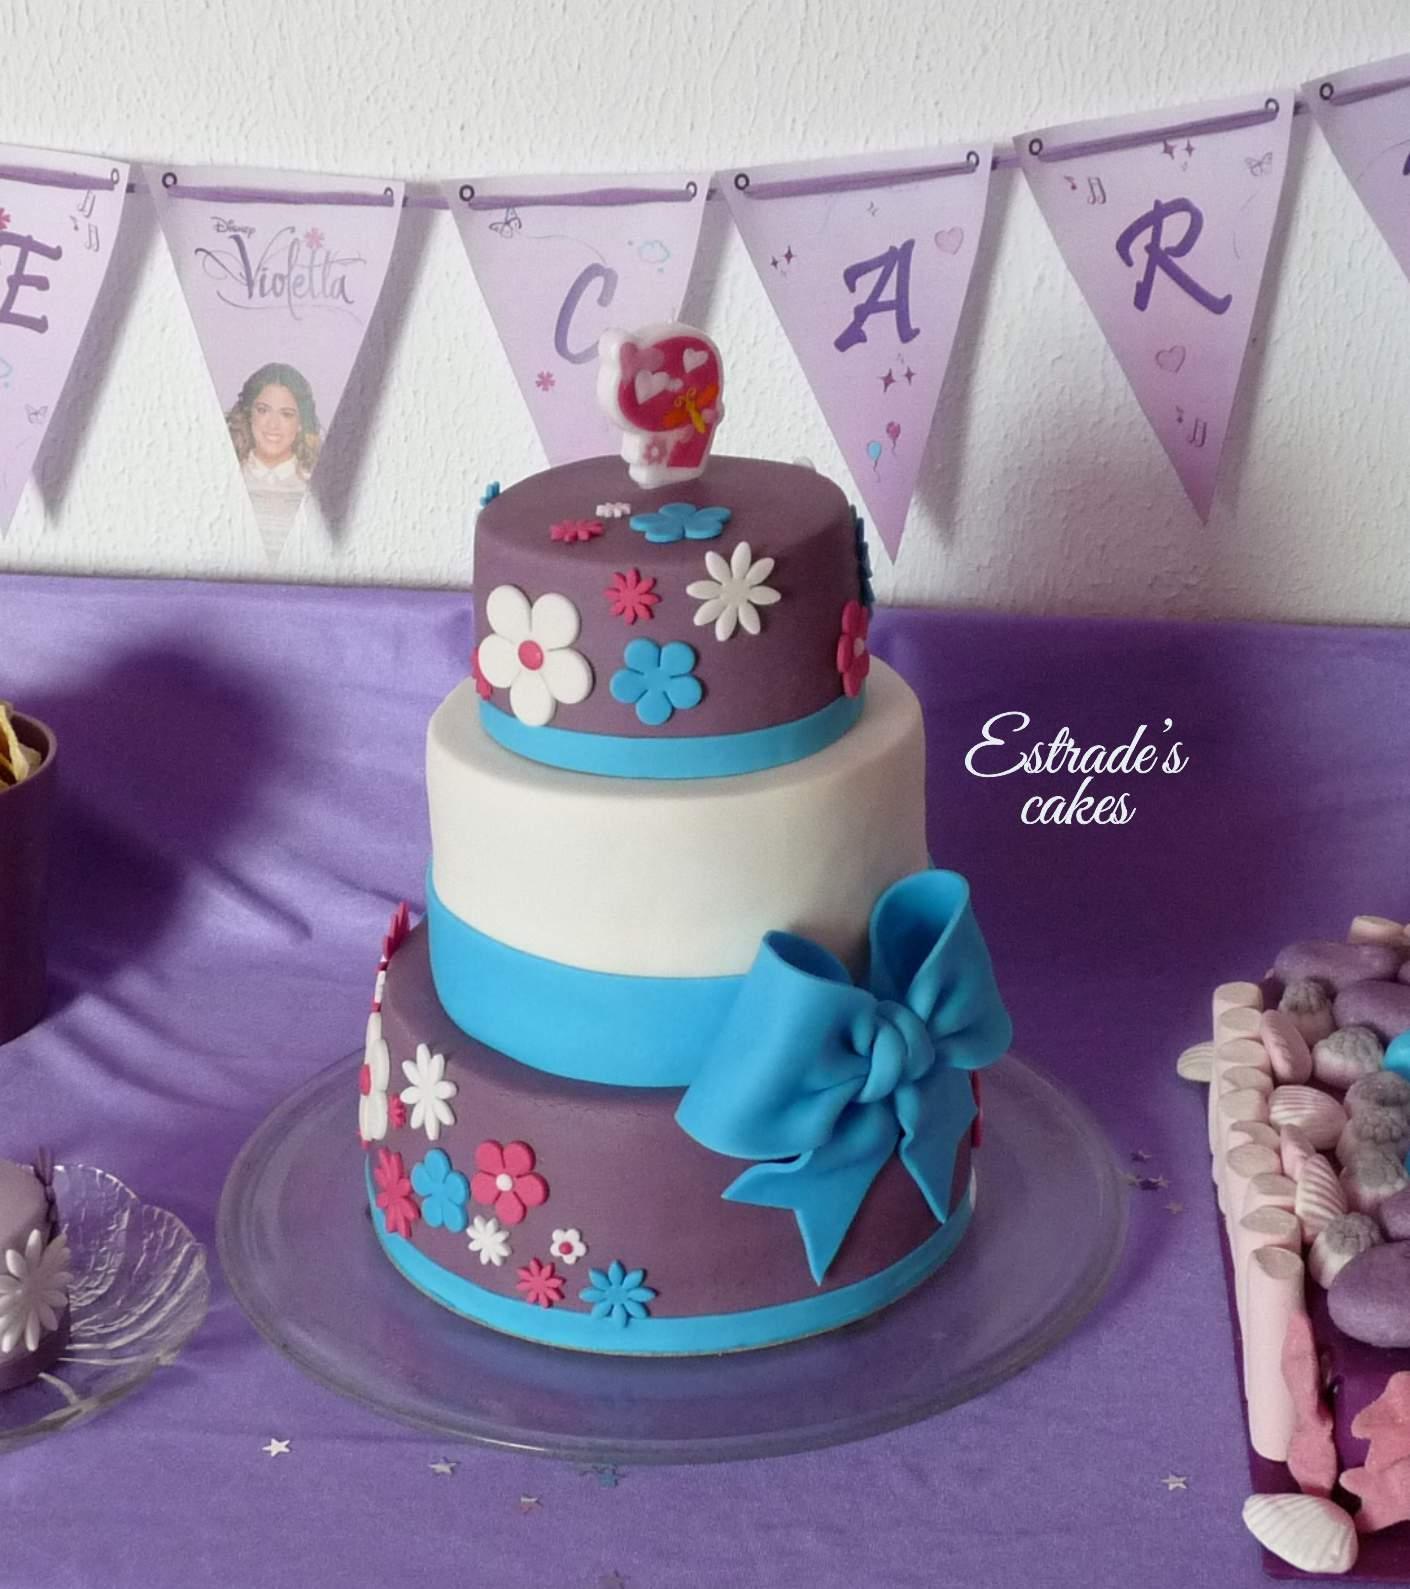 tarta de Violetta para cumpleaños - 3